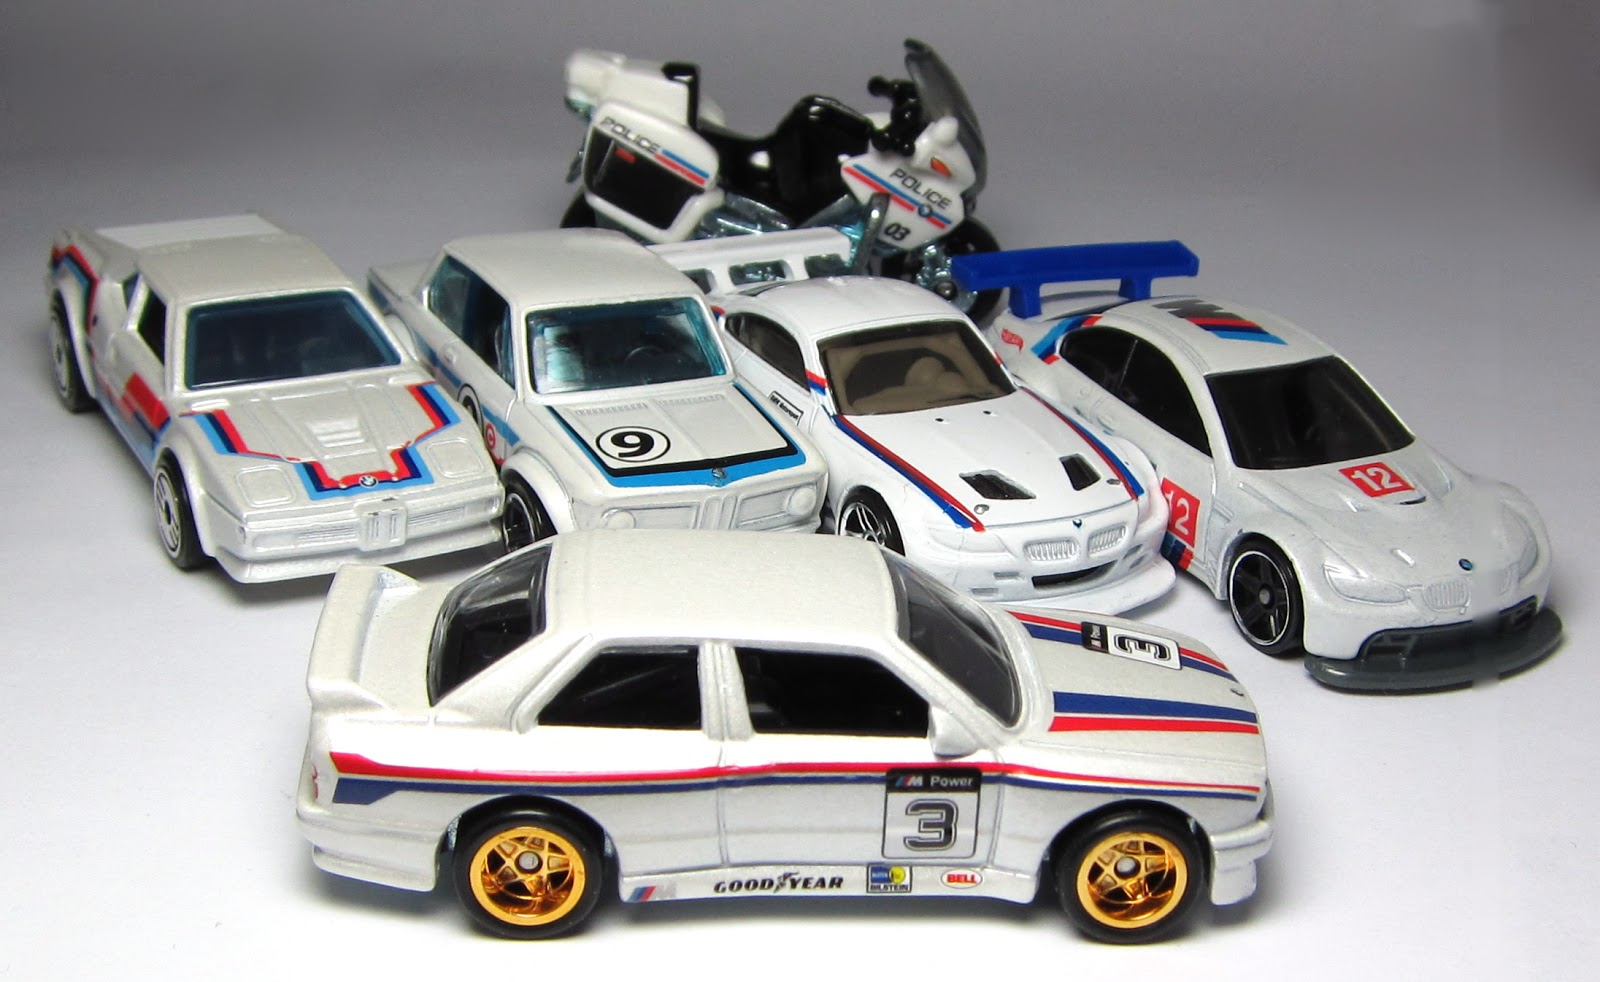 First Look Hot Wheels Racing 92 Bmw M3 Thelamleygroup